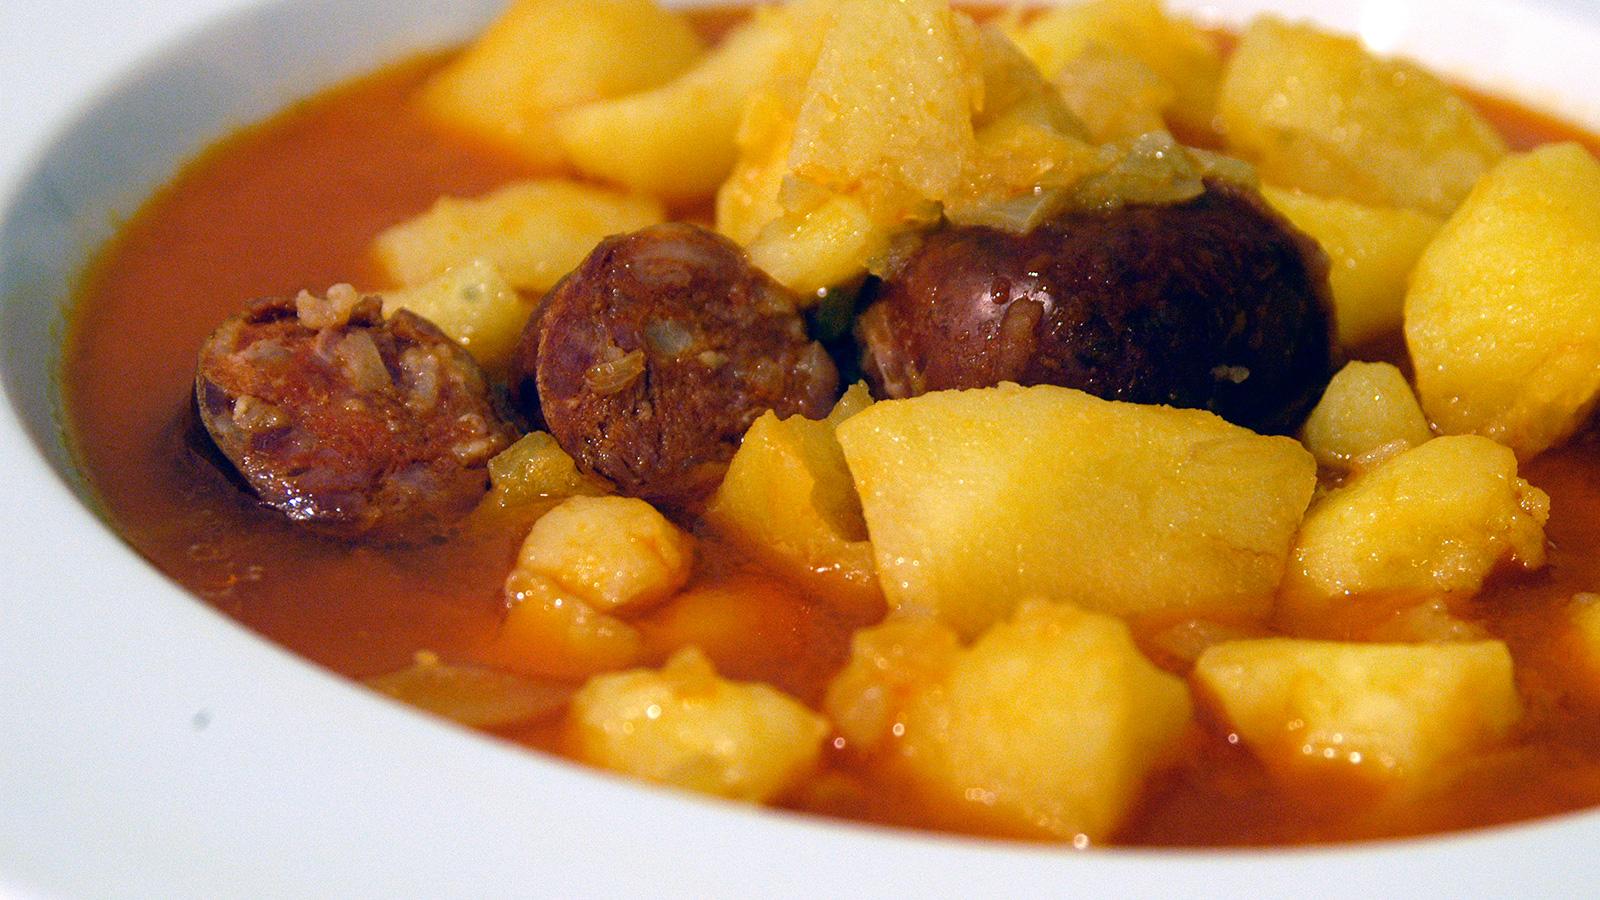 Patatas guisadas con chorizo i aki oyarbide video - Judias con chorizo y patatas ...